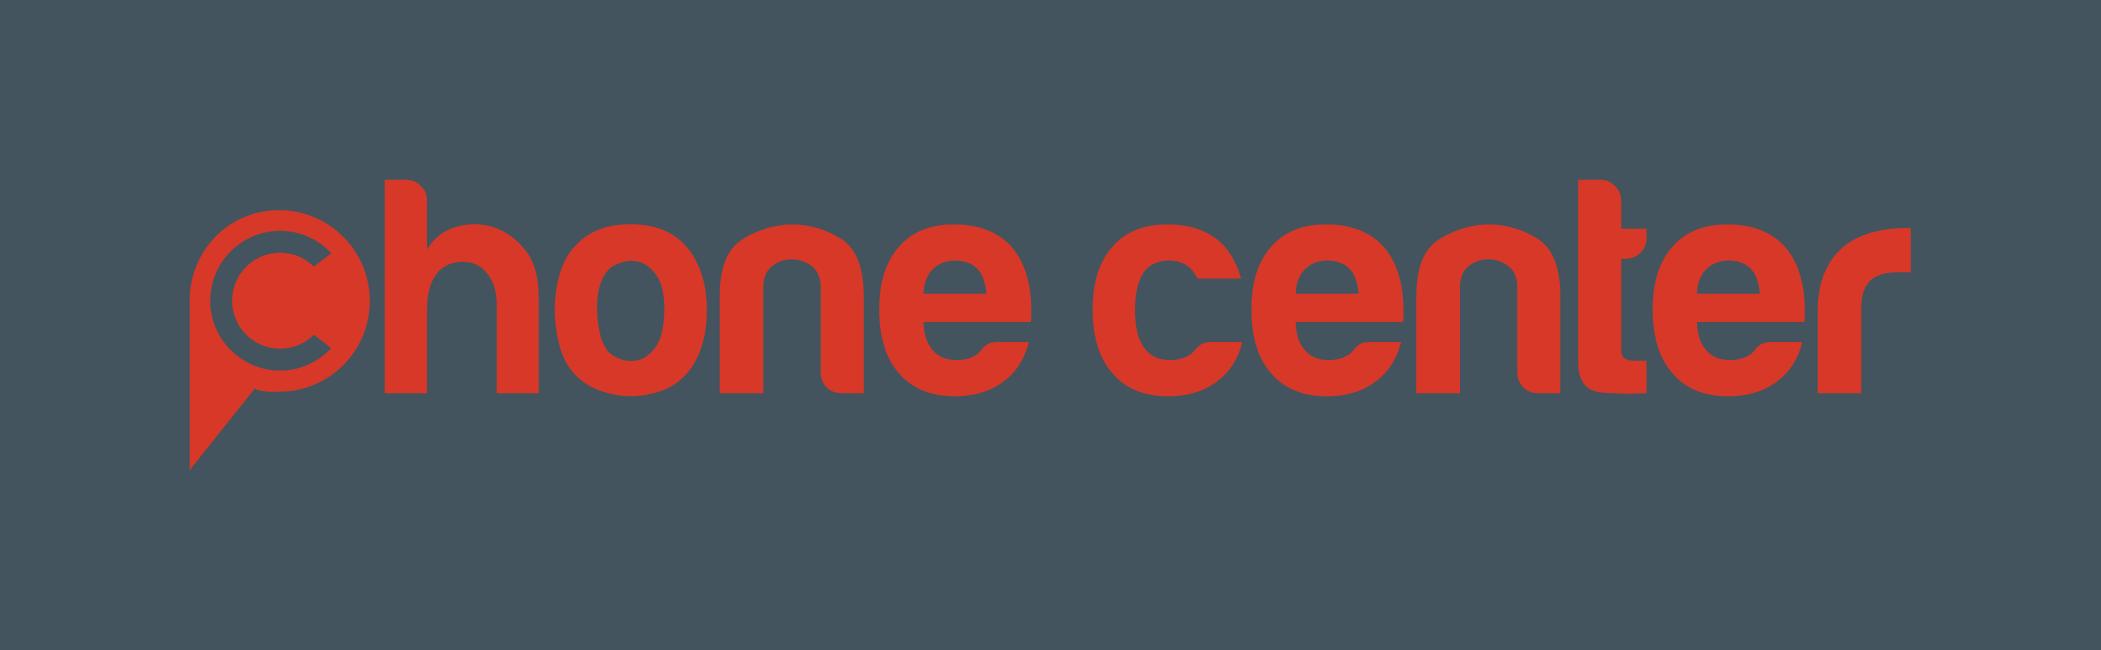 Phone Center